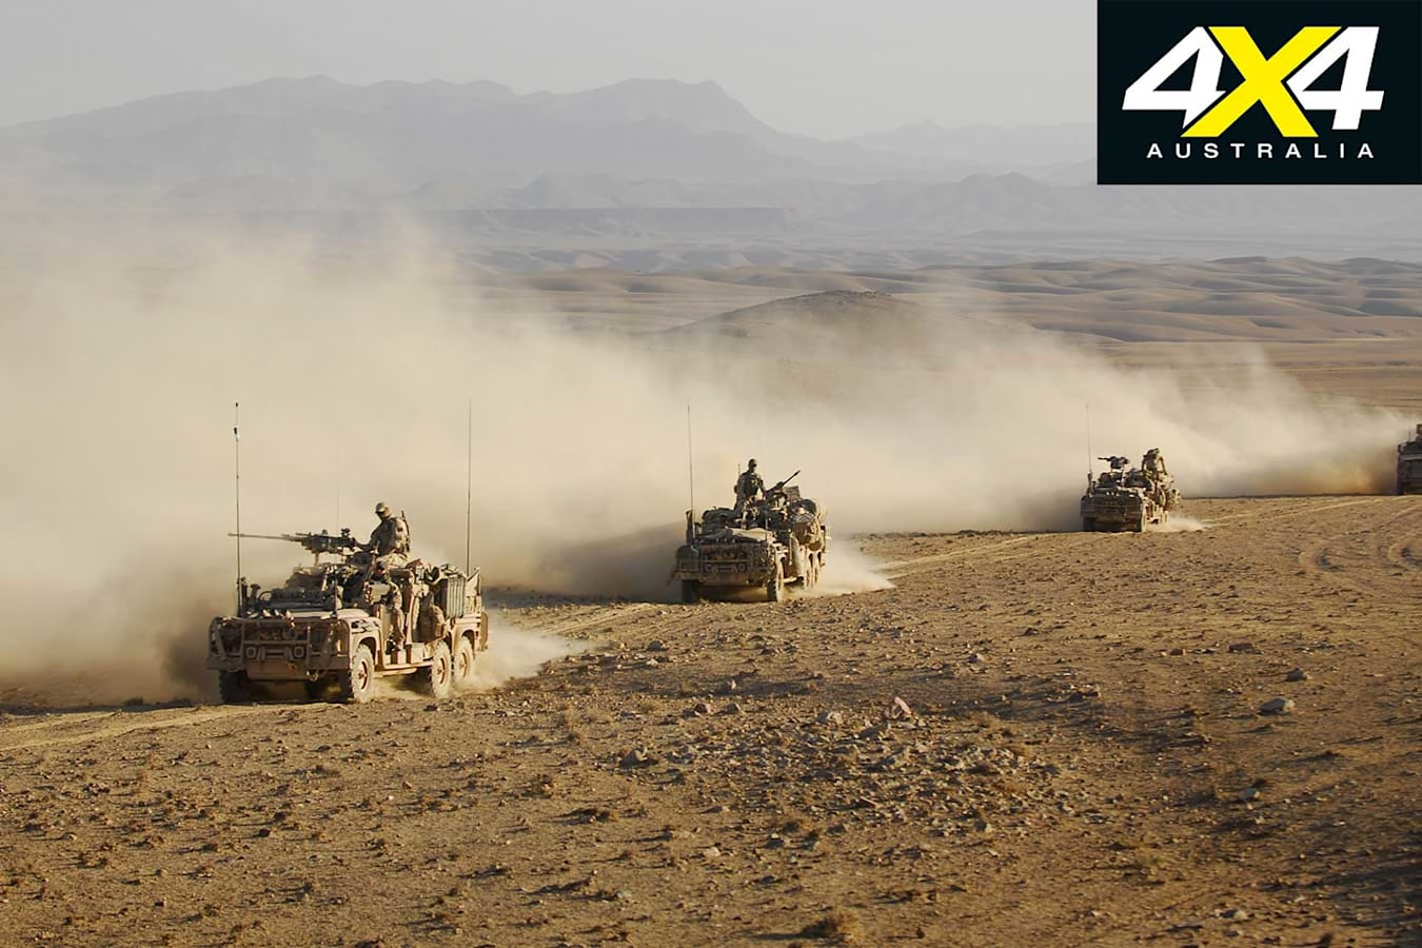 70 Years Of Land Rover 6 X 6 Military Land Rover Desert Training Jpg